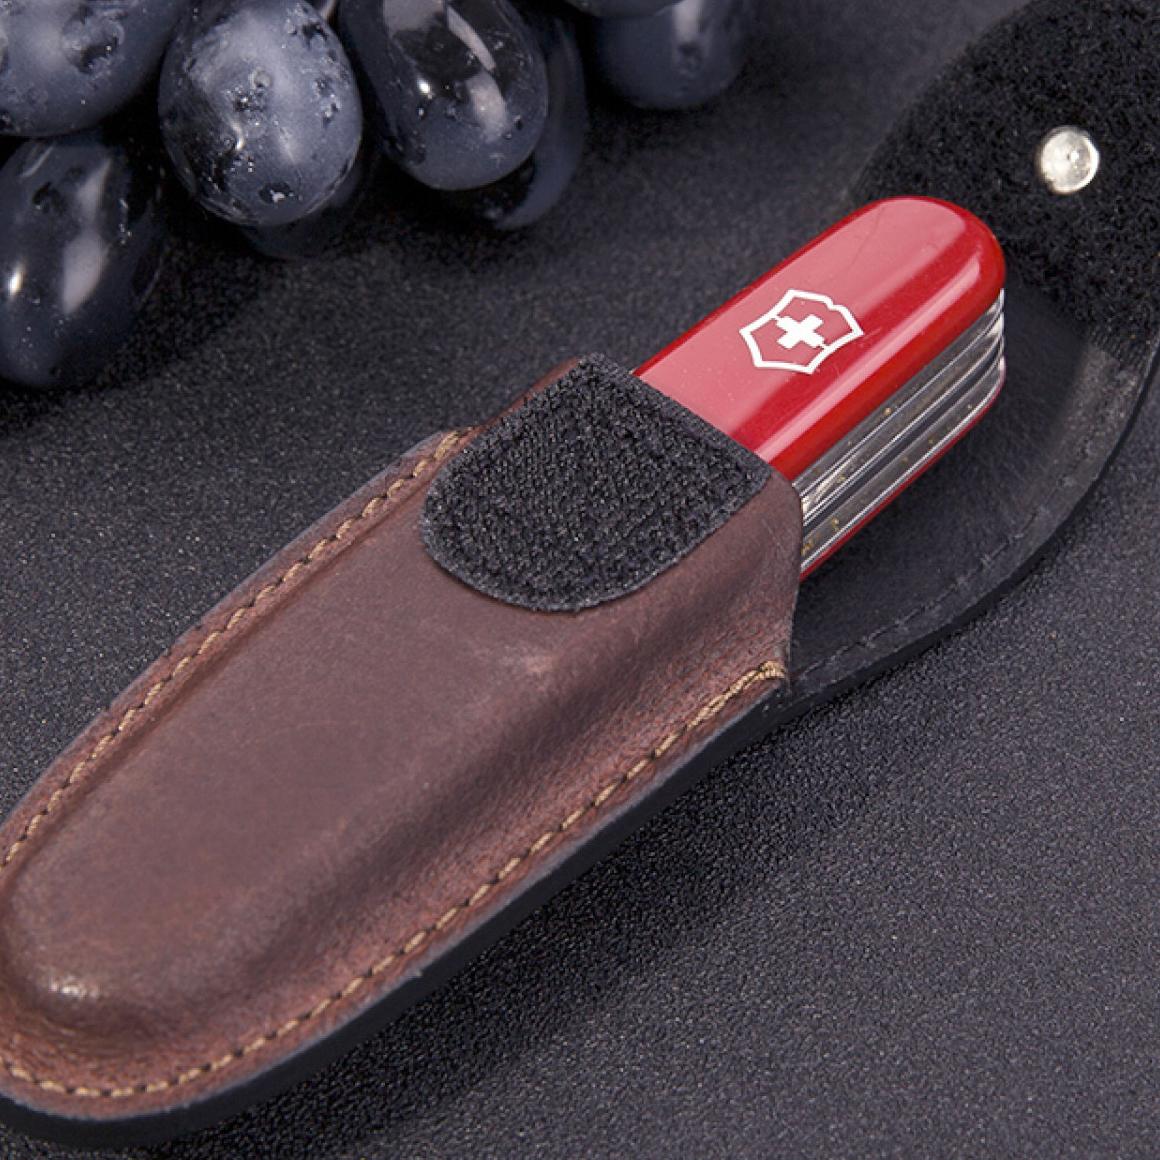 Фото 6 - Чехол для ножей Victorinox Leather Belt Pouch, коричневый, кожа